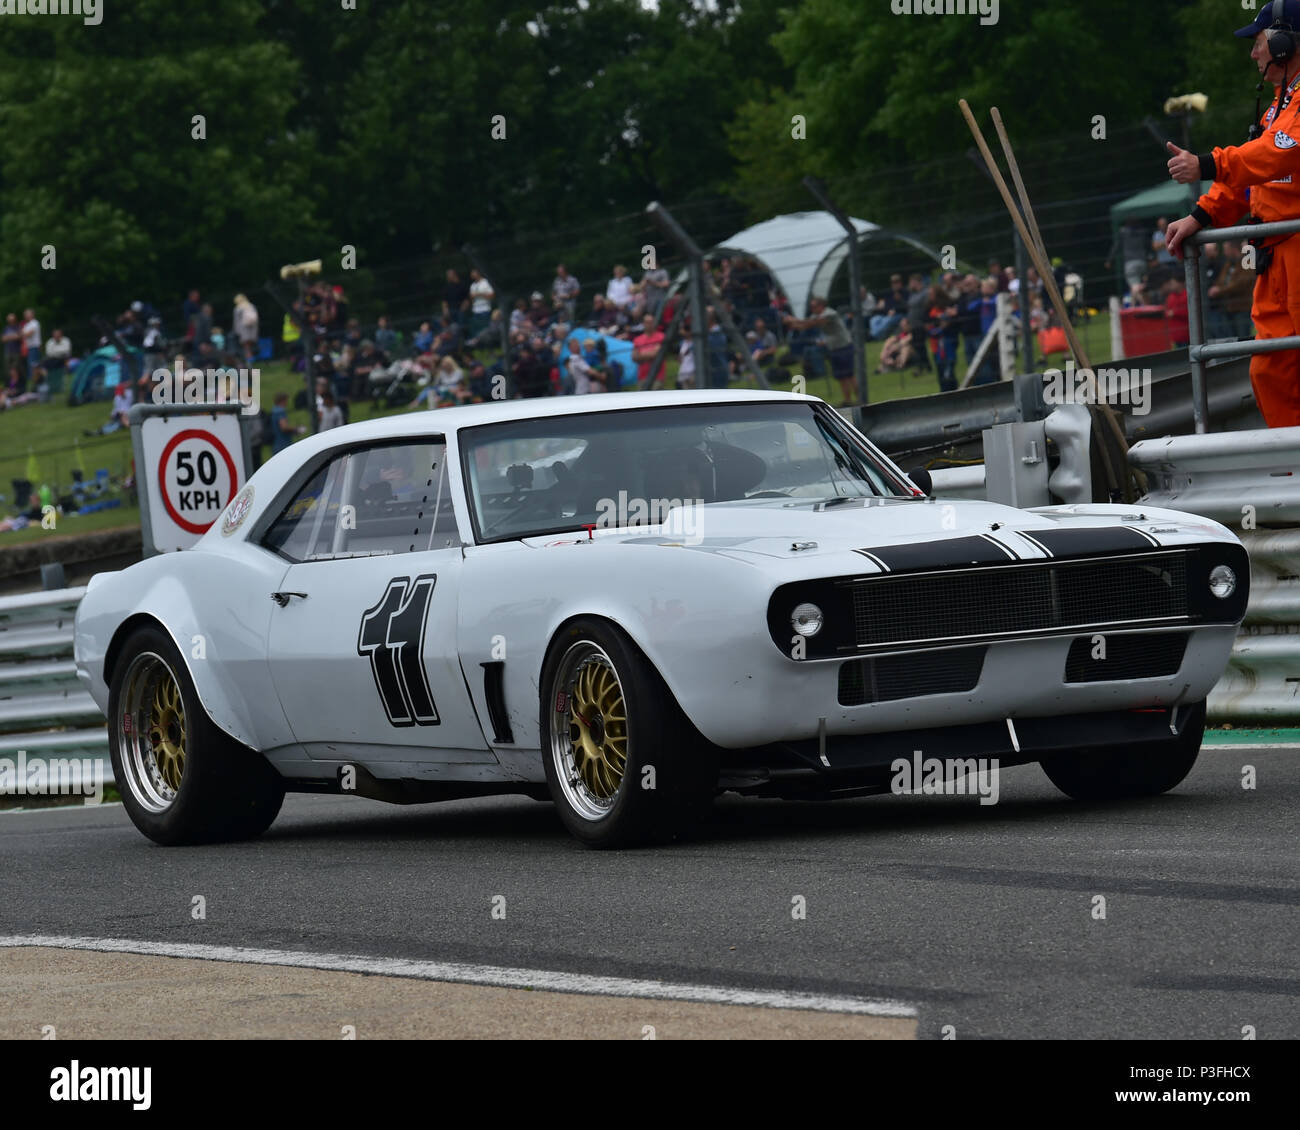 Faber Gerard Chevrolet Camaro Bernie S V8s Us Muscle Cars